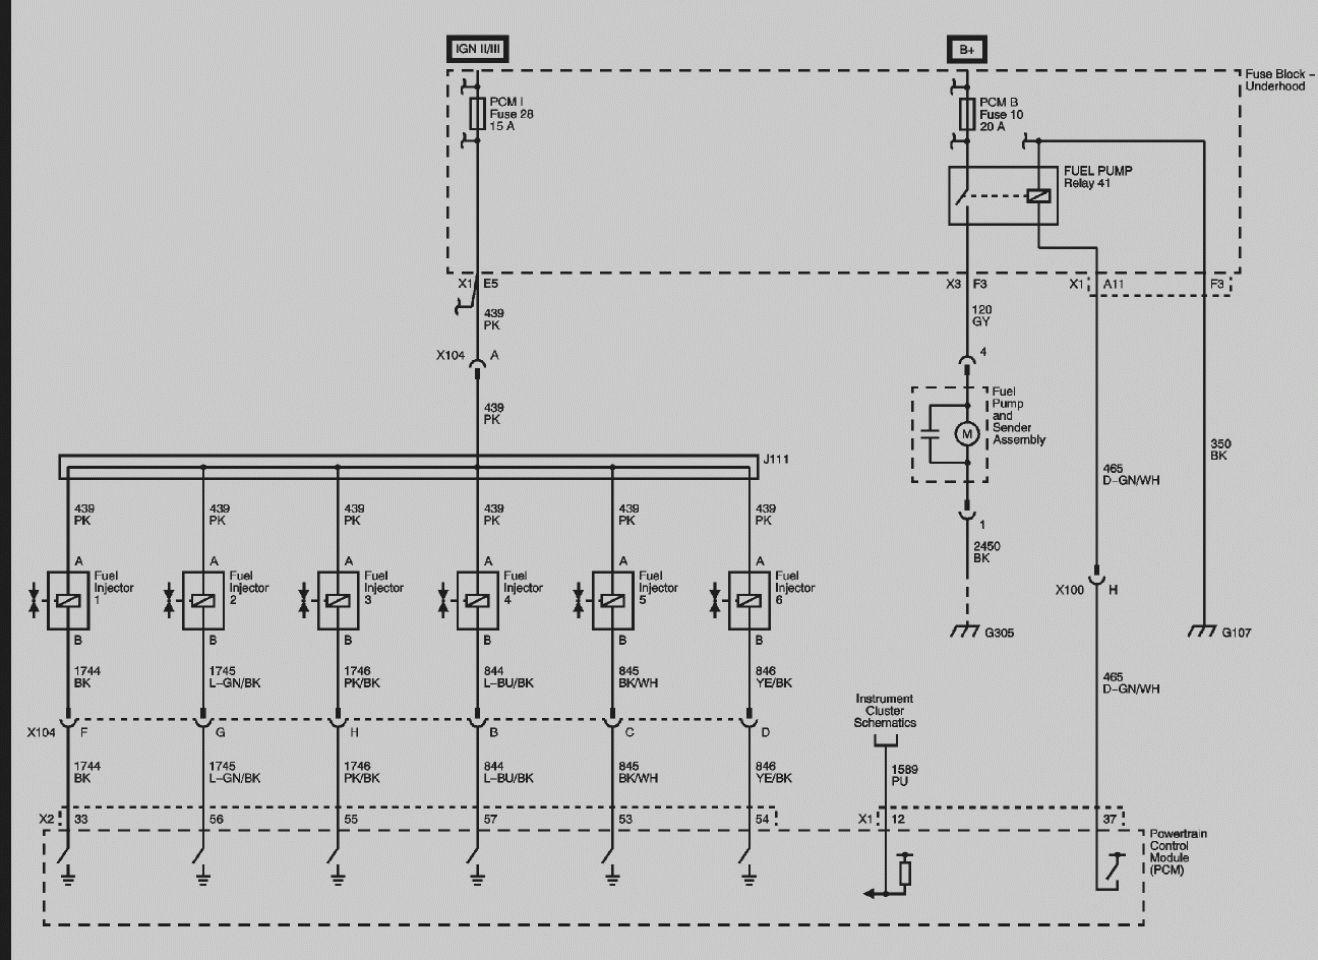 Fuel Injector Wiring Harness Diagram Electrical Drawing Wiring Within Fuel Injector Wiring Diagram 97 Ford Ranger Fuel Injection Electrical Circuit Diagram